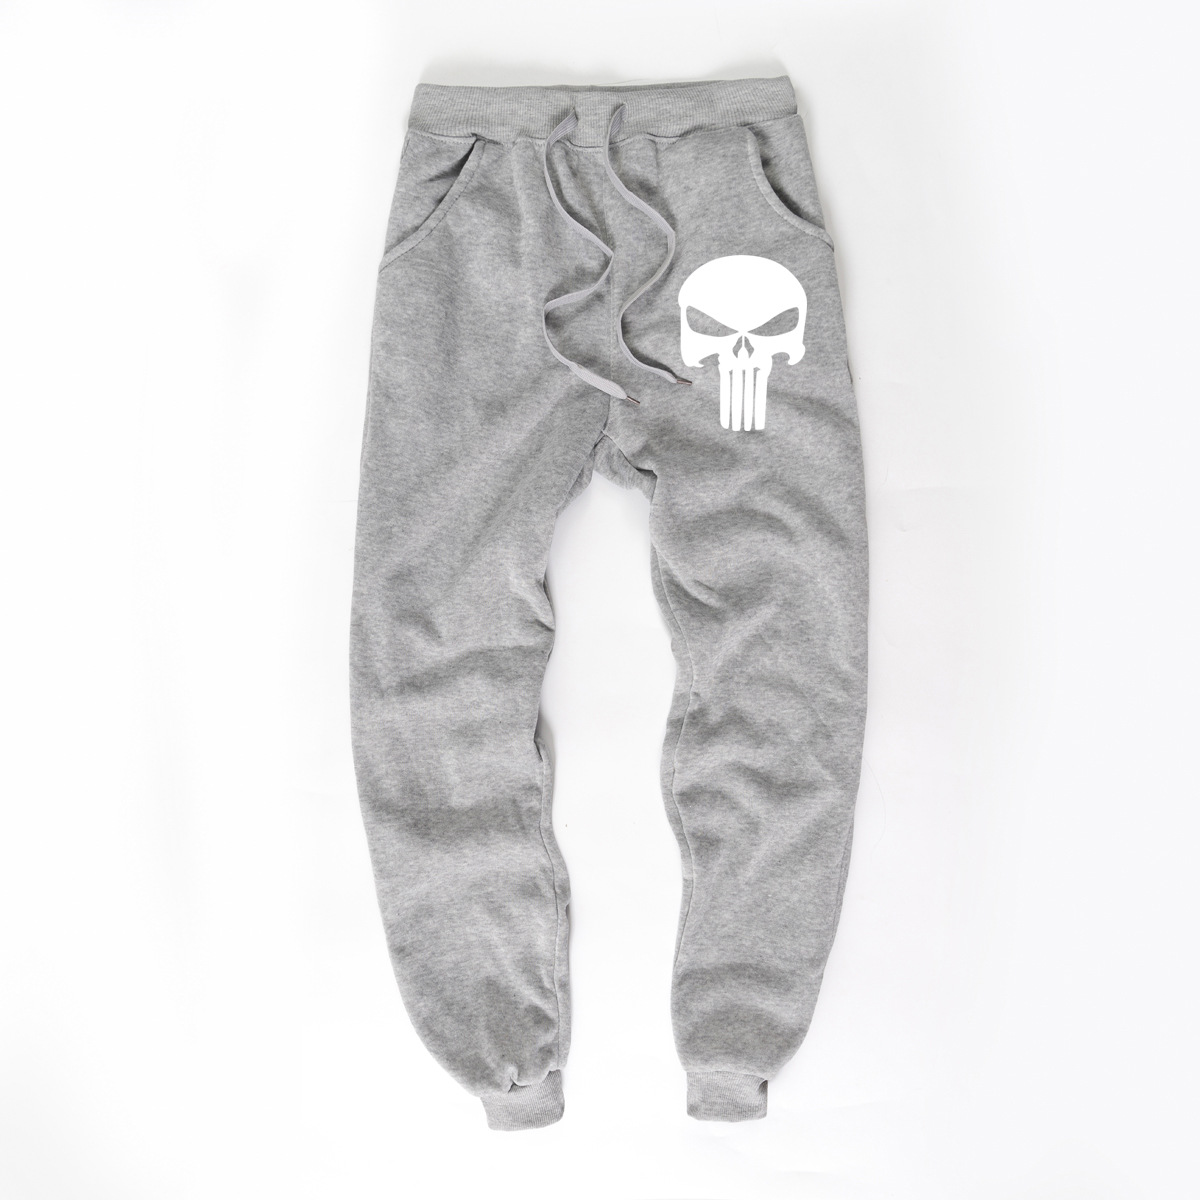 Men's Sweatpants Punisher New Fleece Trousers Gym Sportswear Autumn And Winter Causal Streetwear Unisex Wholesale Drop Shipping